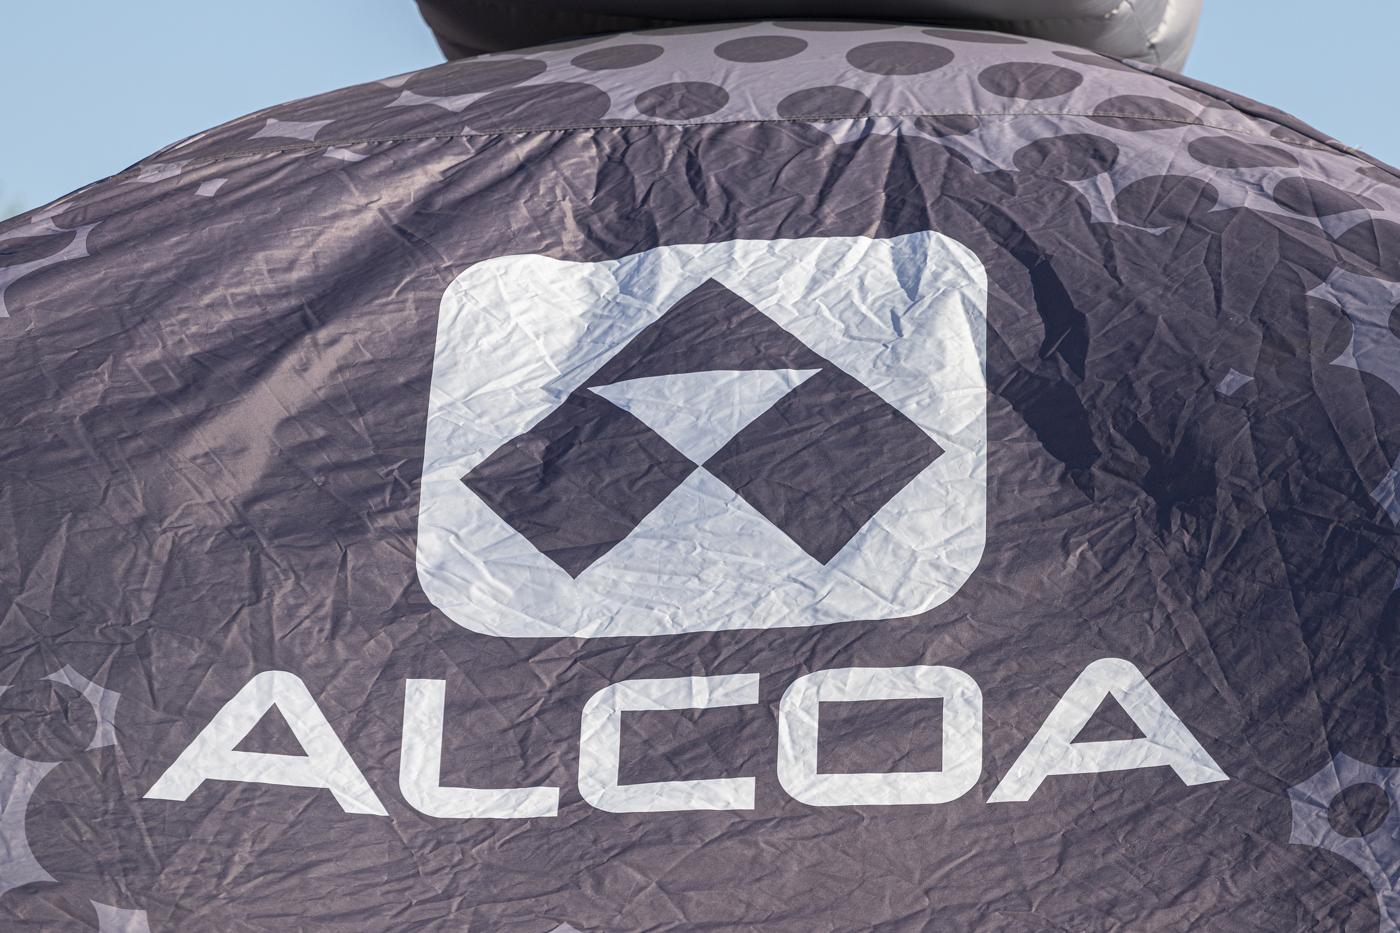 Alcoa stock, AA stock, AA stock news